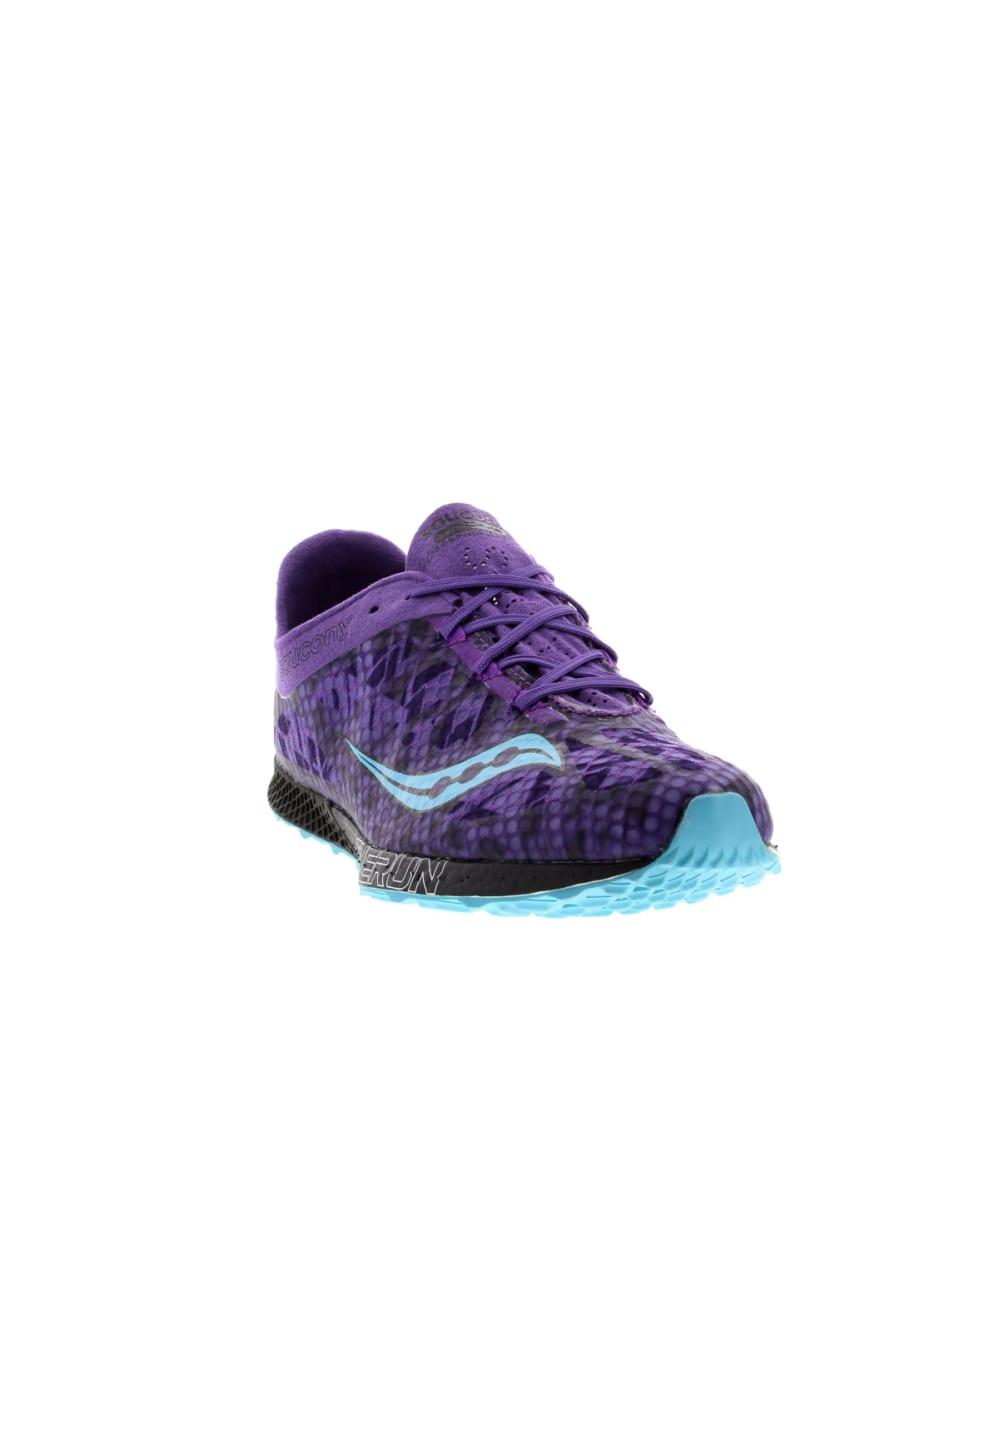 fed539e4eab3 Saucony Endorphin Racer 2 - Running shoes for Women - Purple